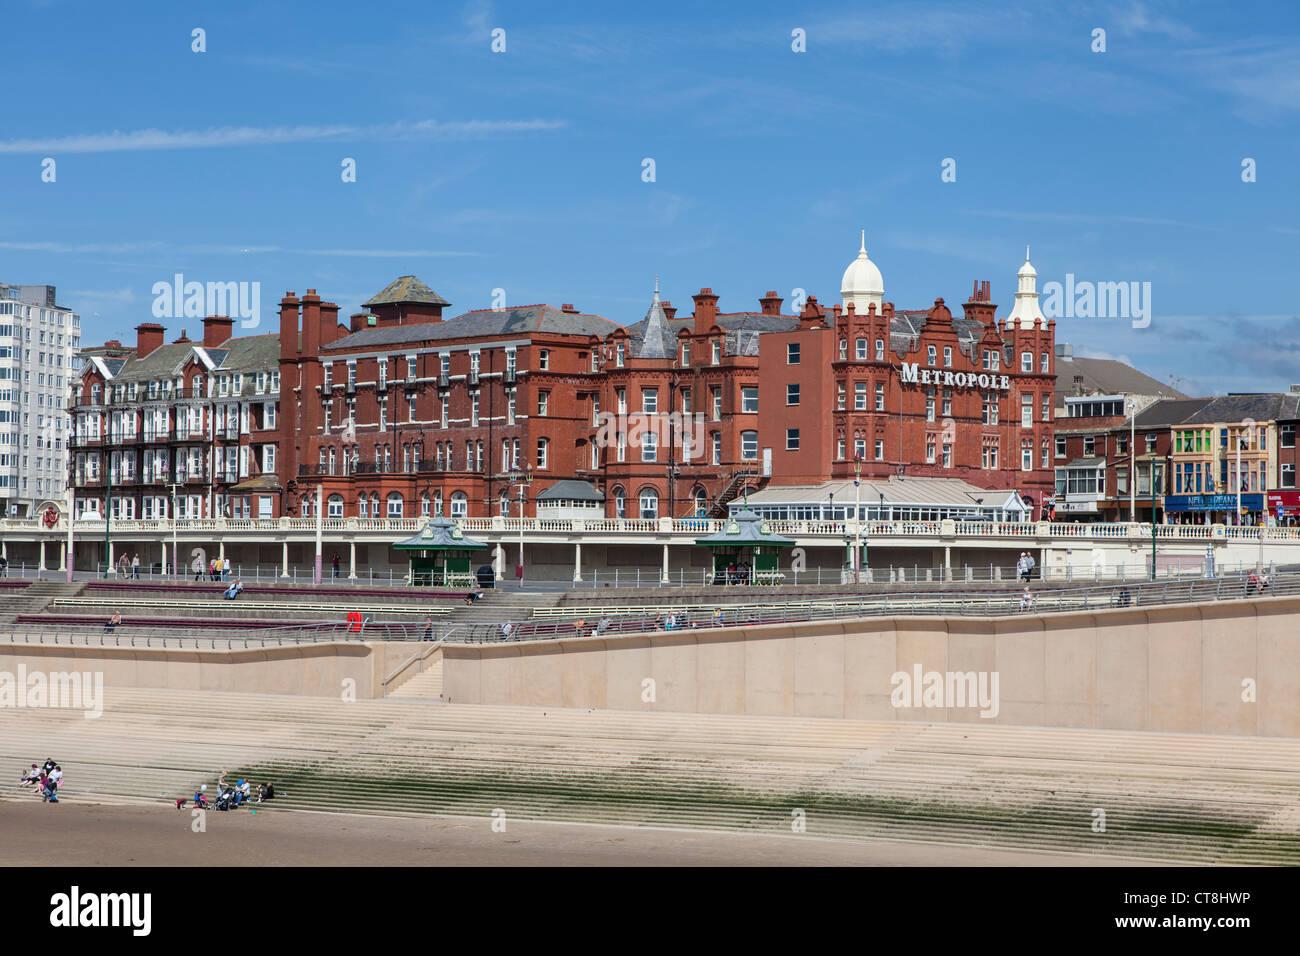 Metropole Hotel, Blackpool - Stock Image